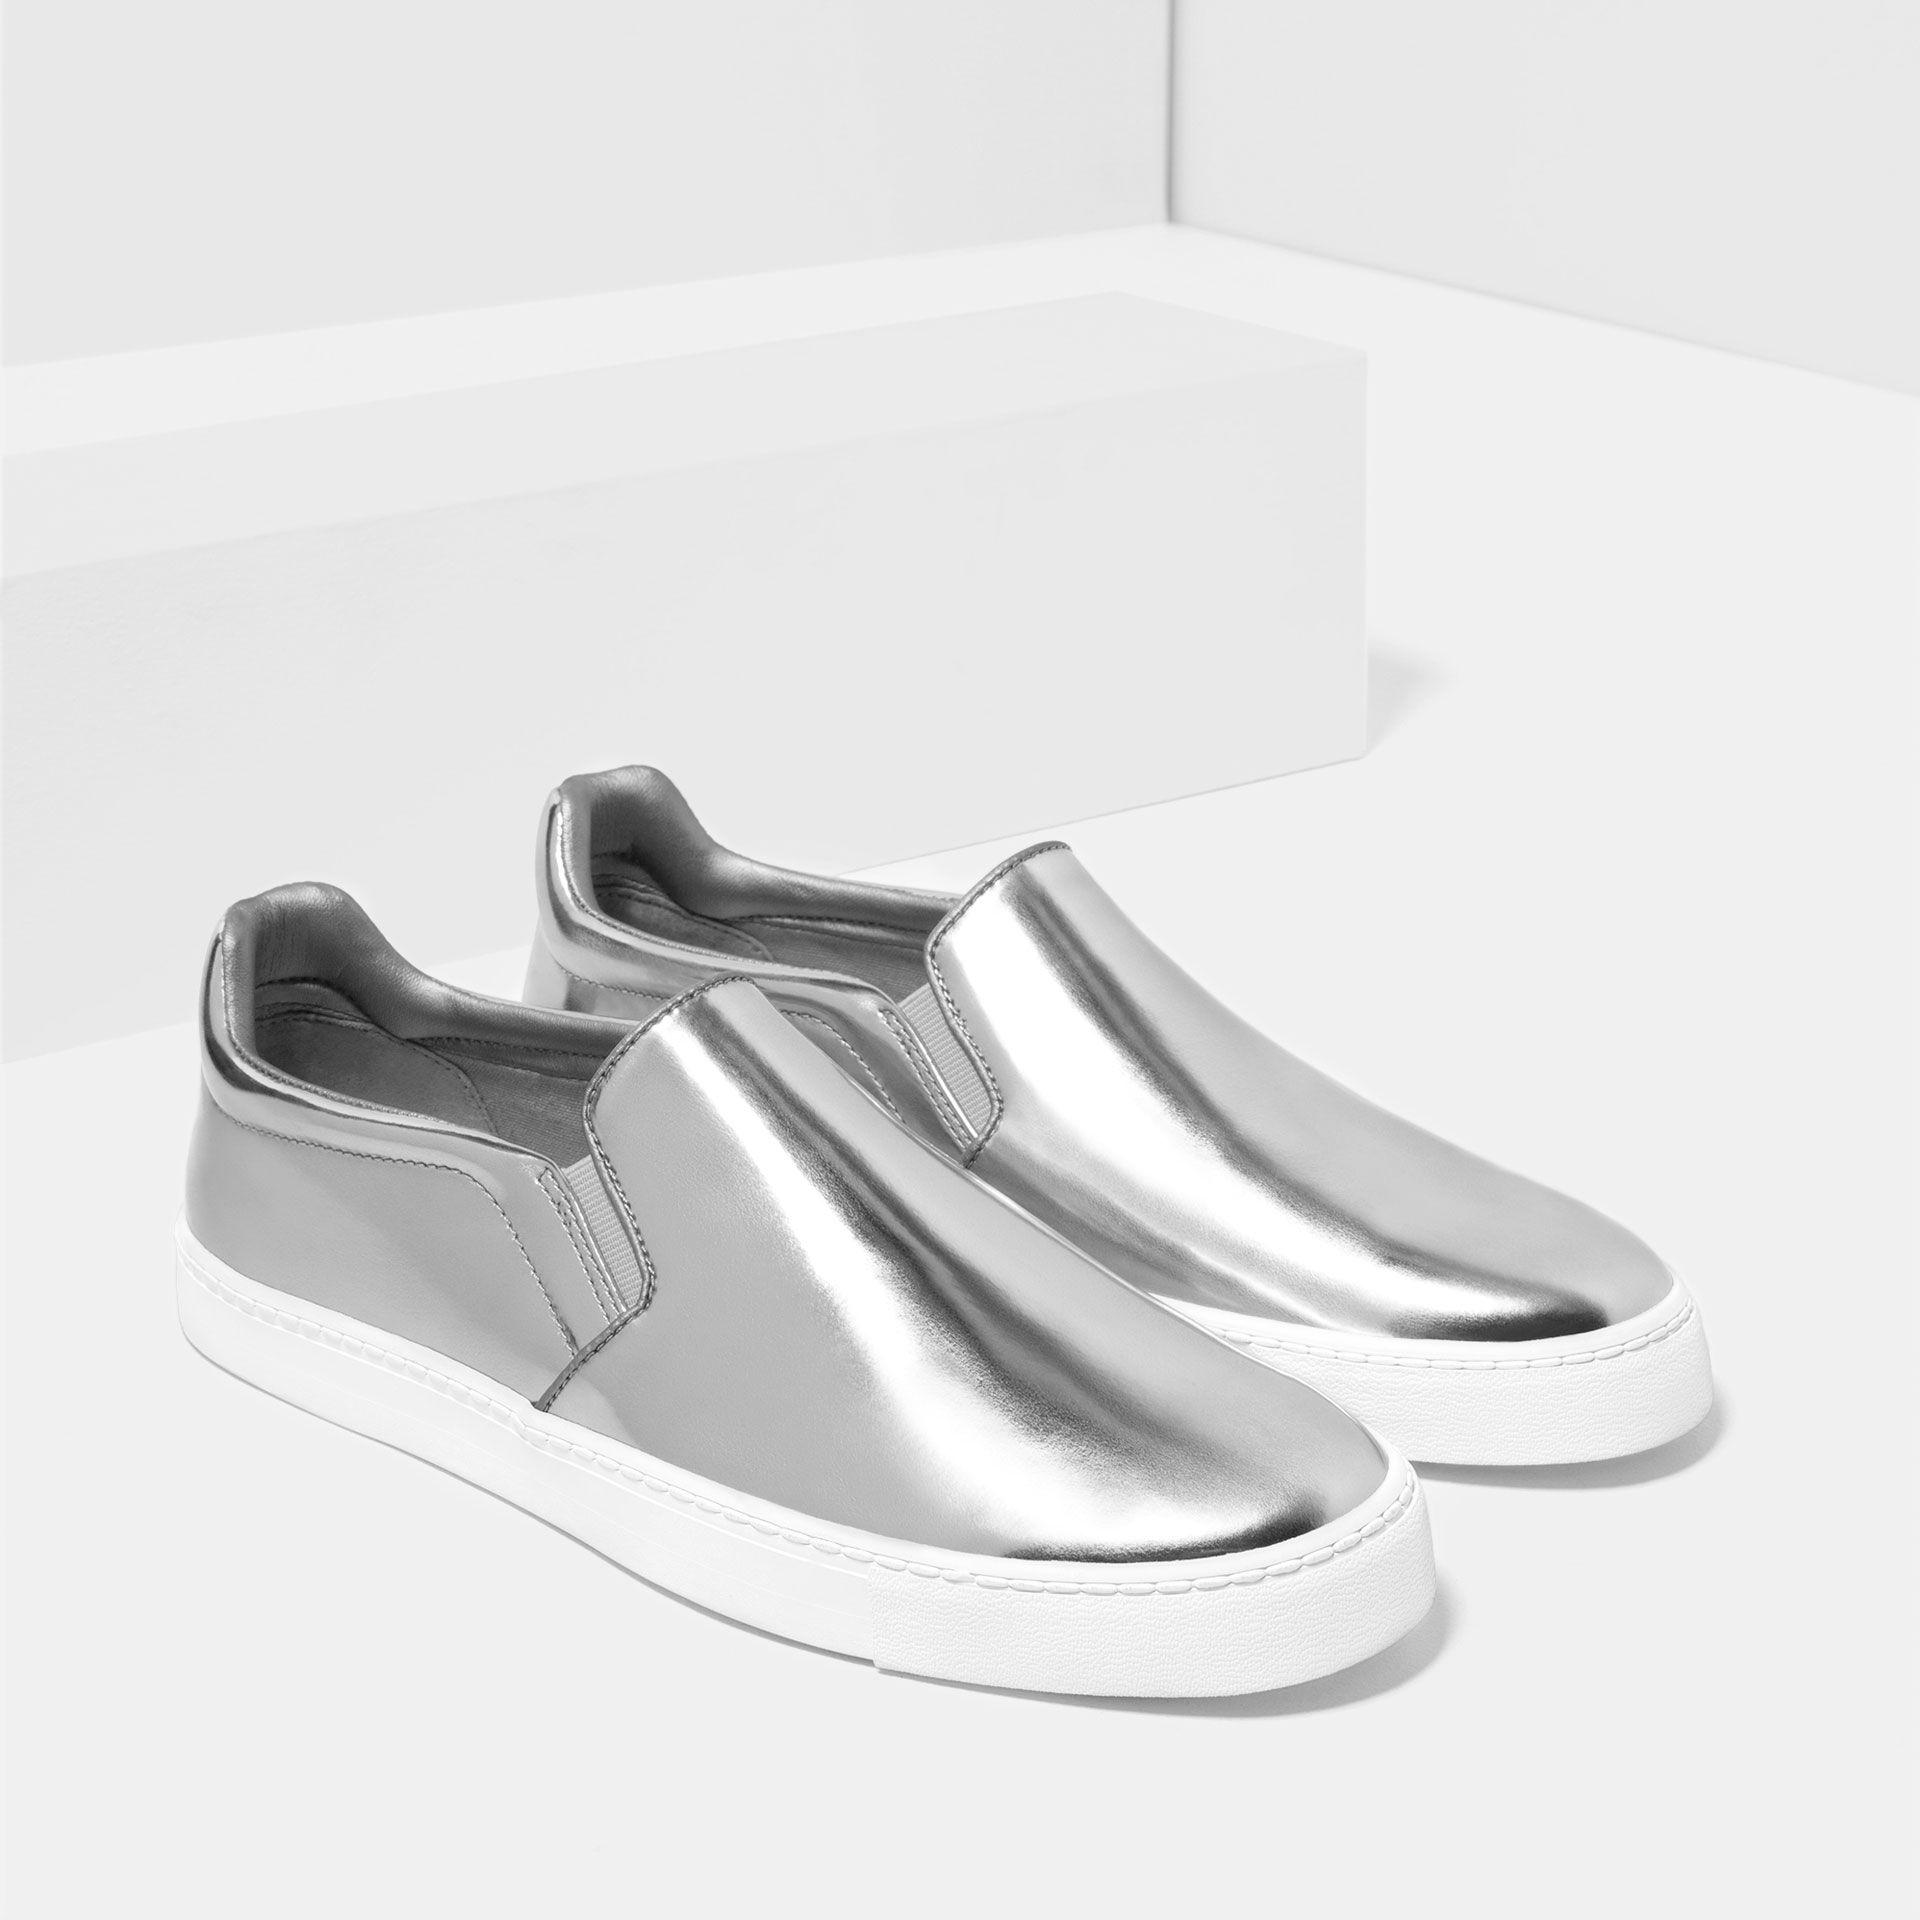 f18fb6d0 Pin by Nicholas Zhou on Style in 2019 | Zara sneakers, Sneakers, Shoes